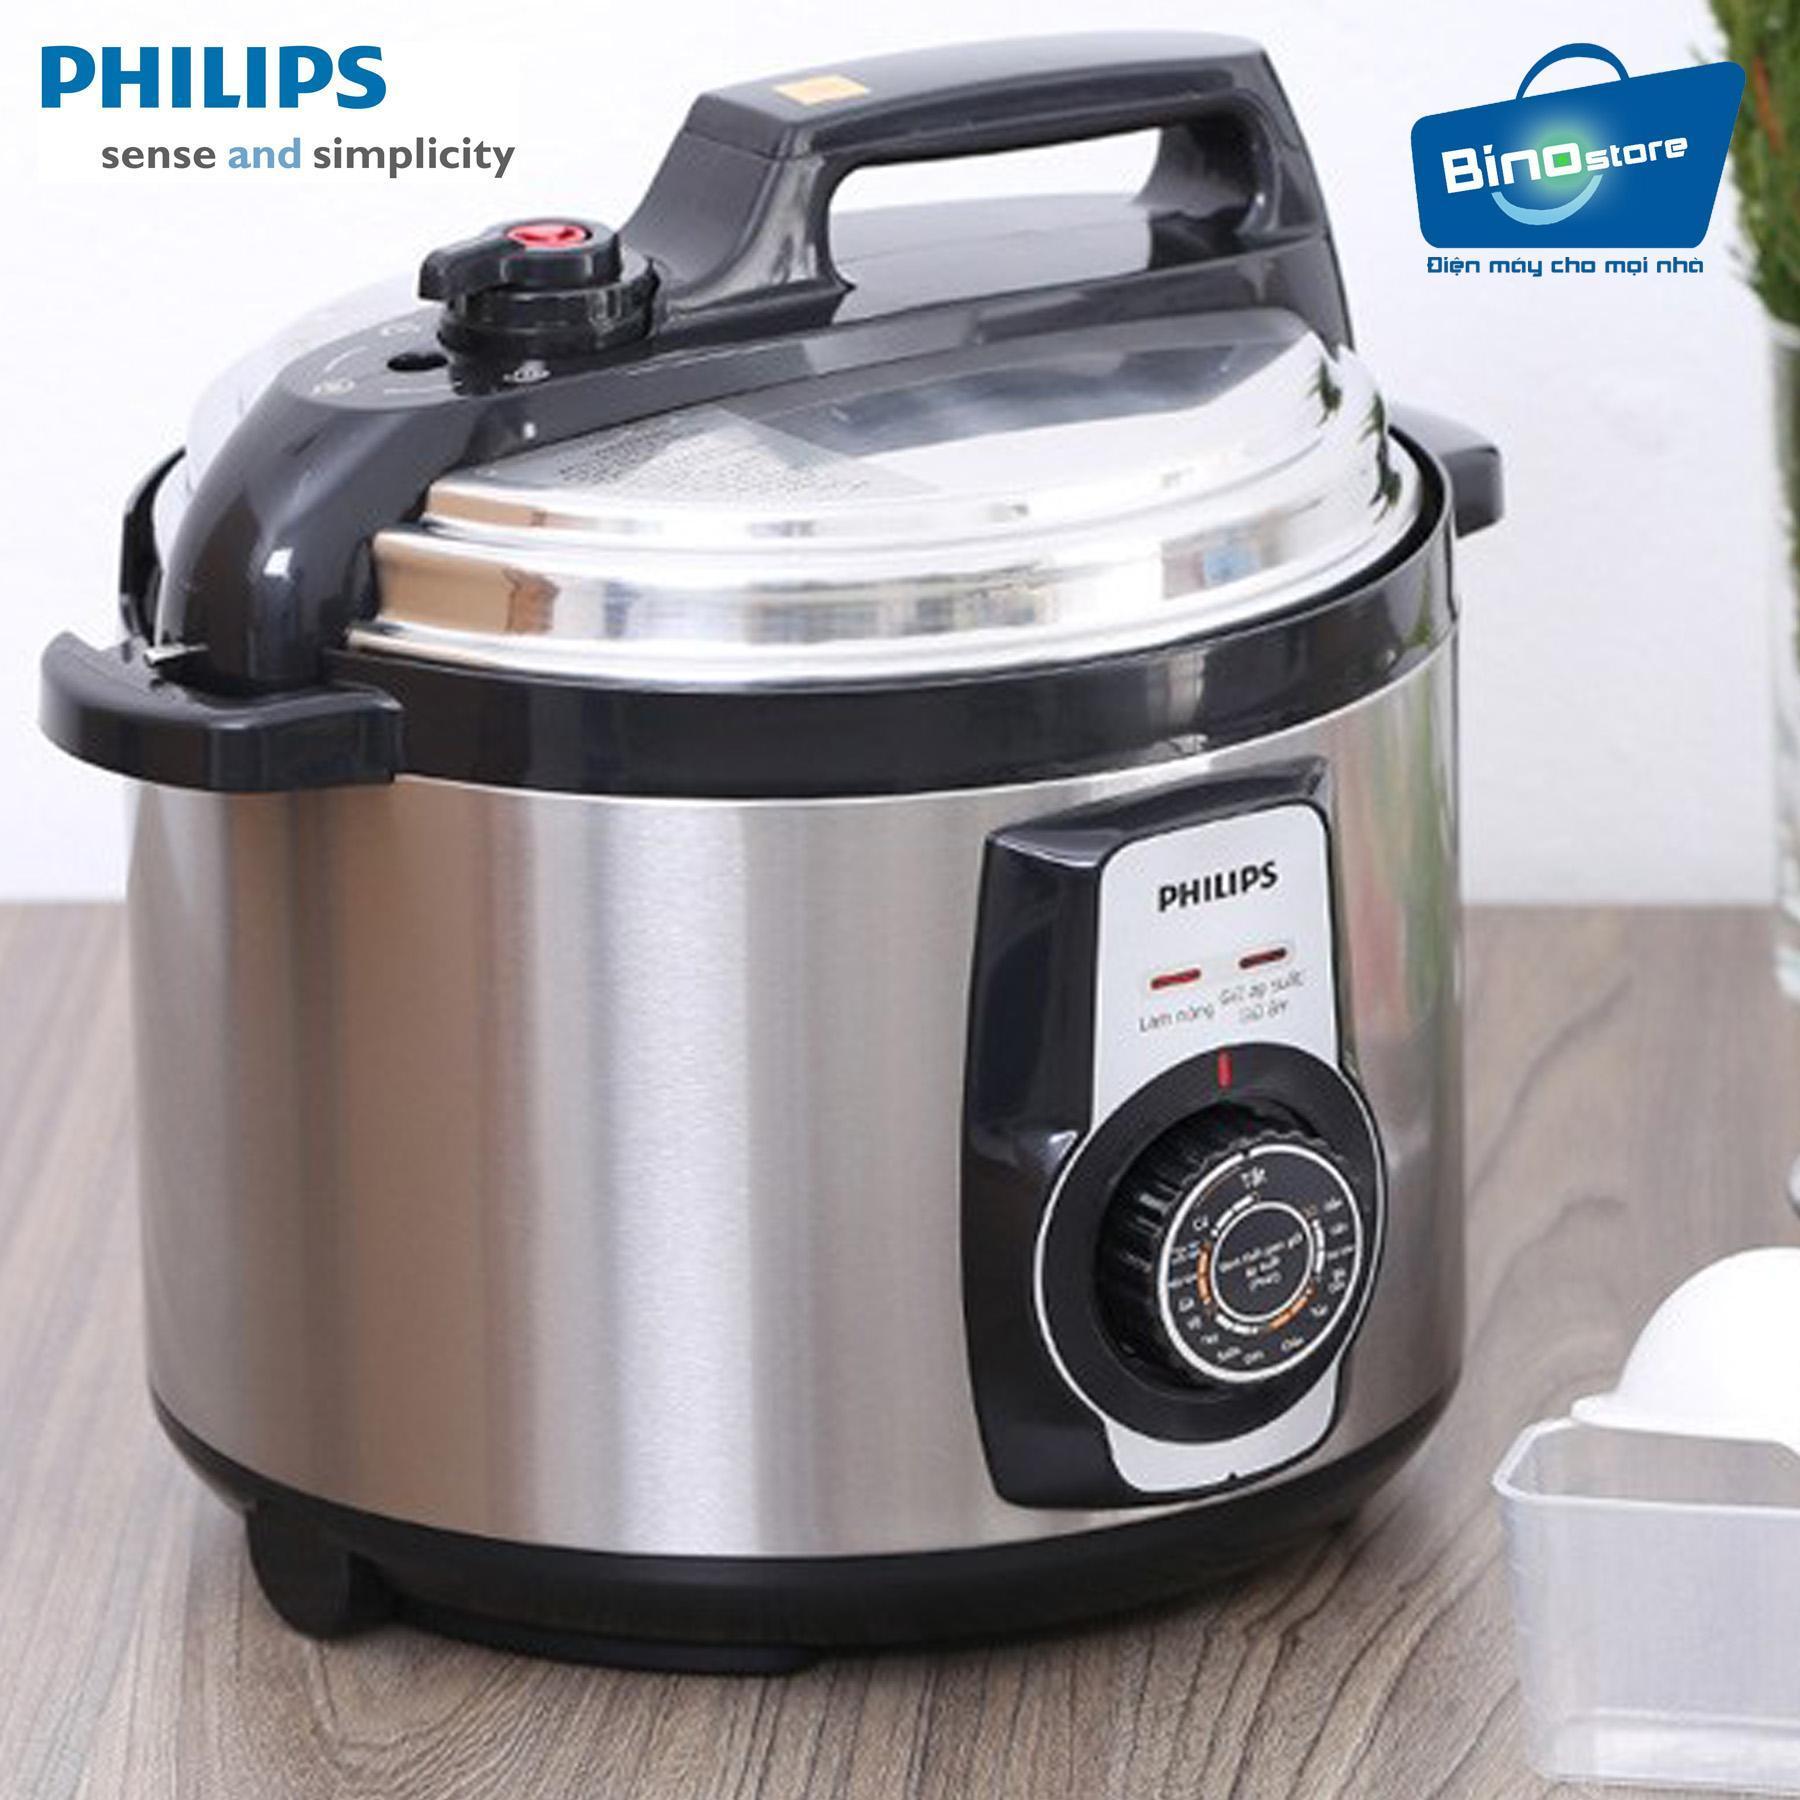 Nồi áp suất cao cấp Philips HD2103 (Inox) 5L